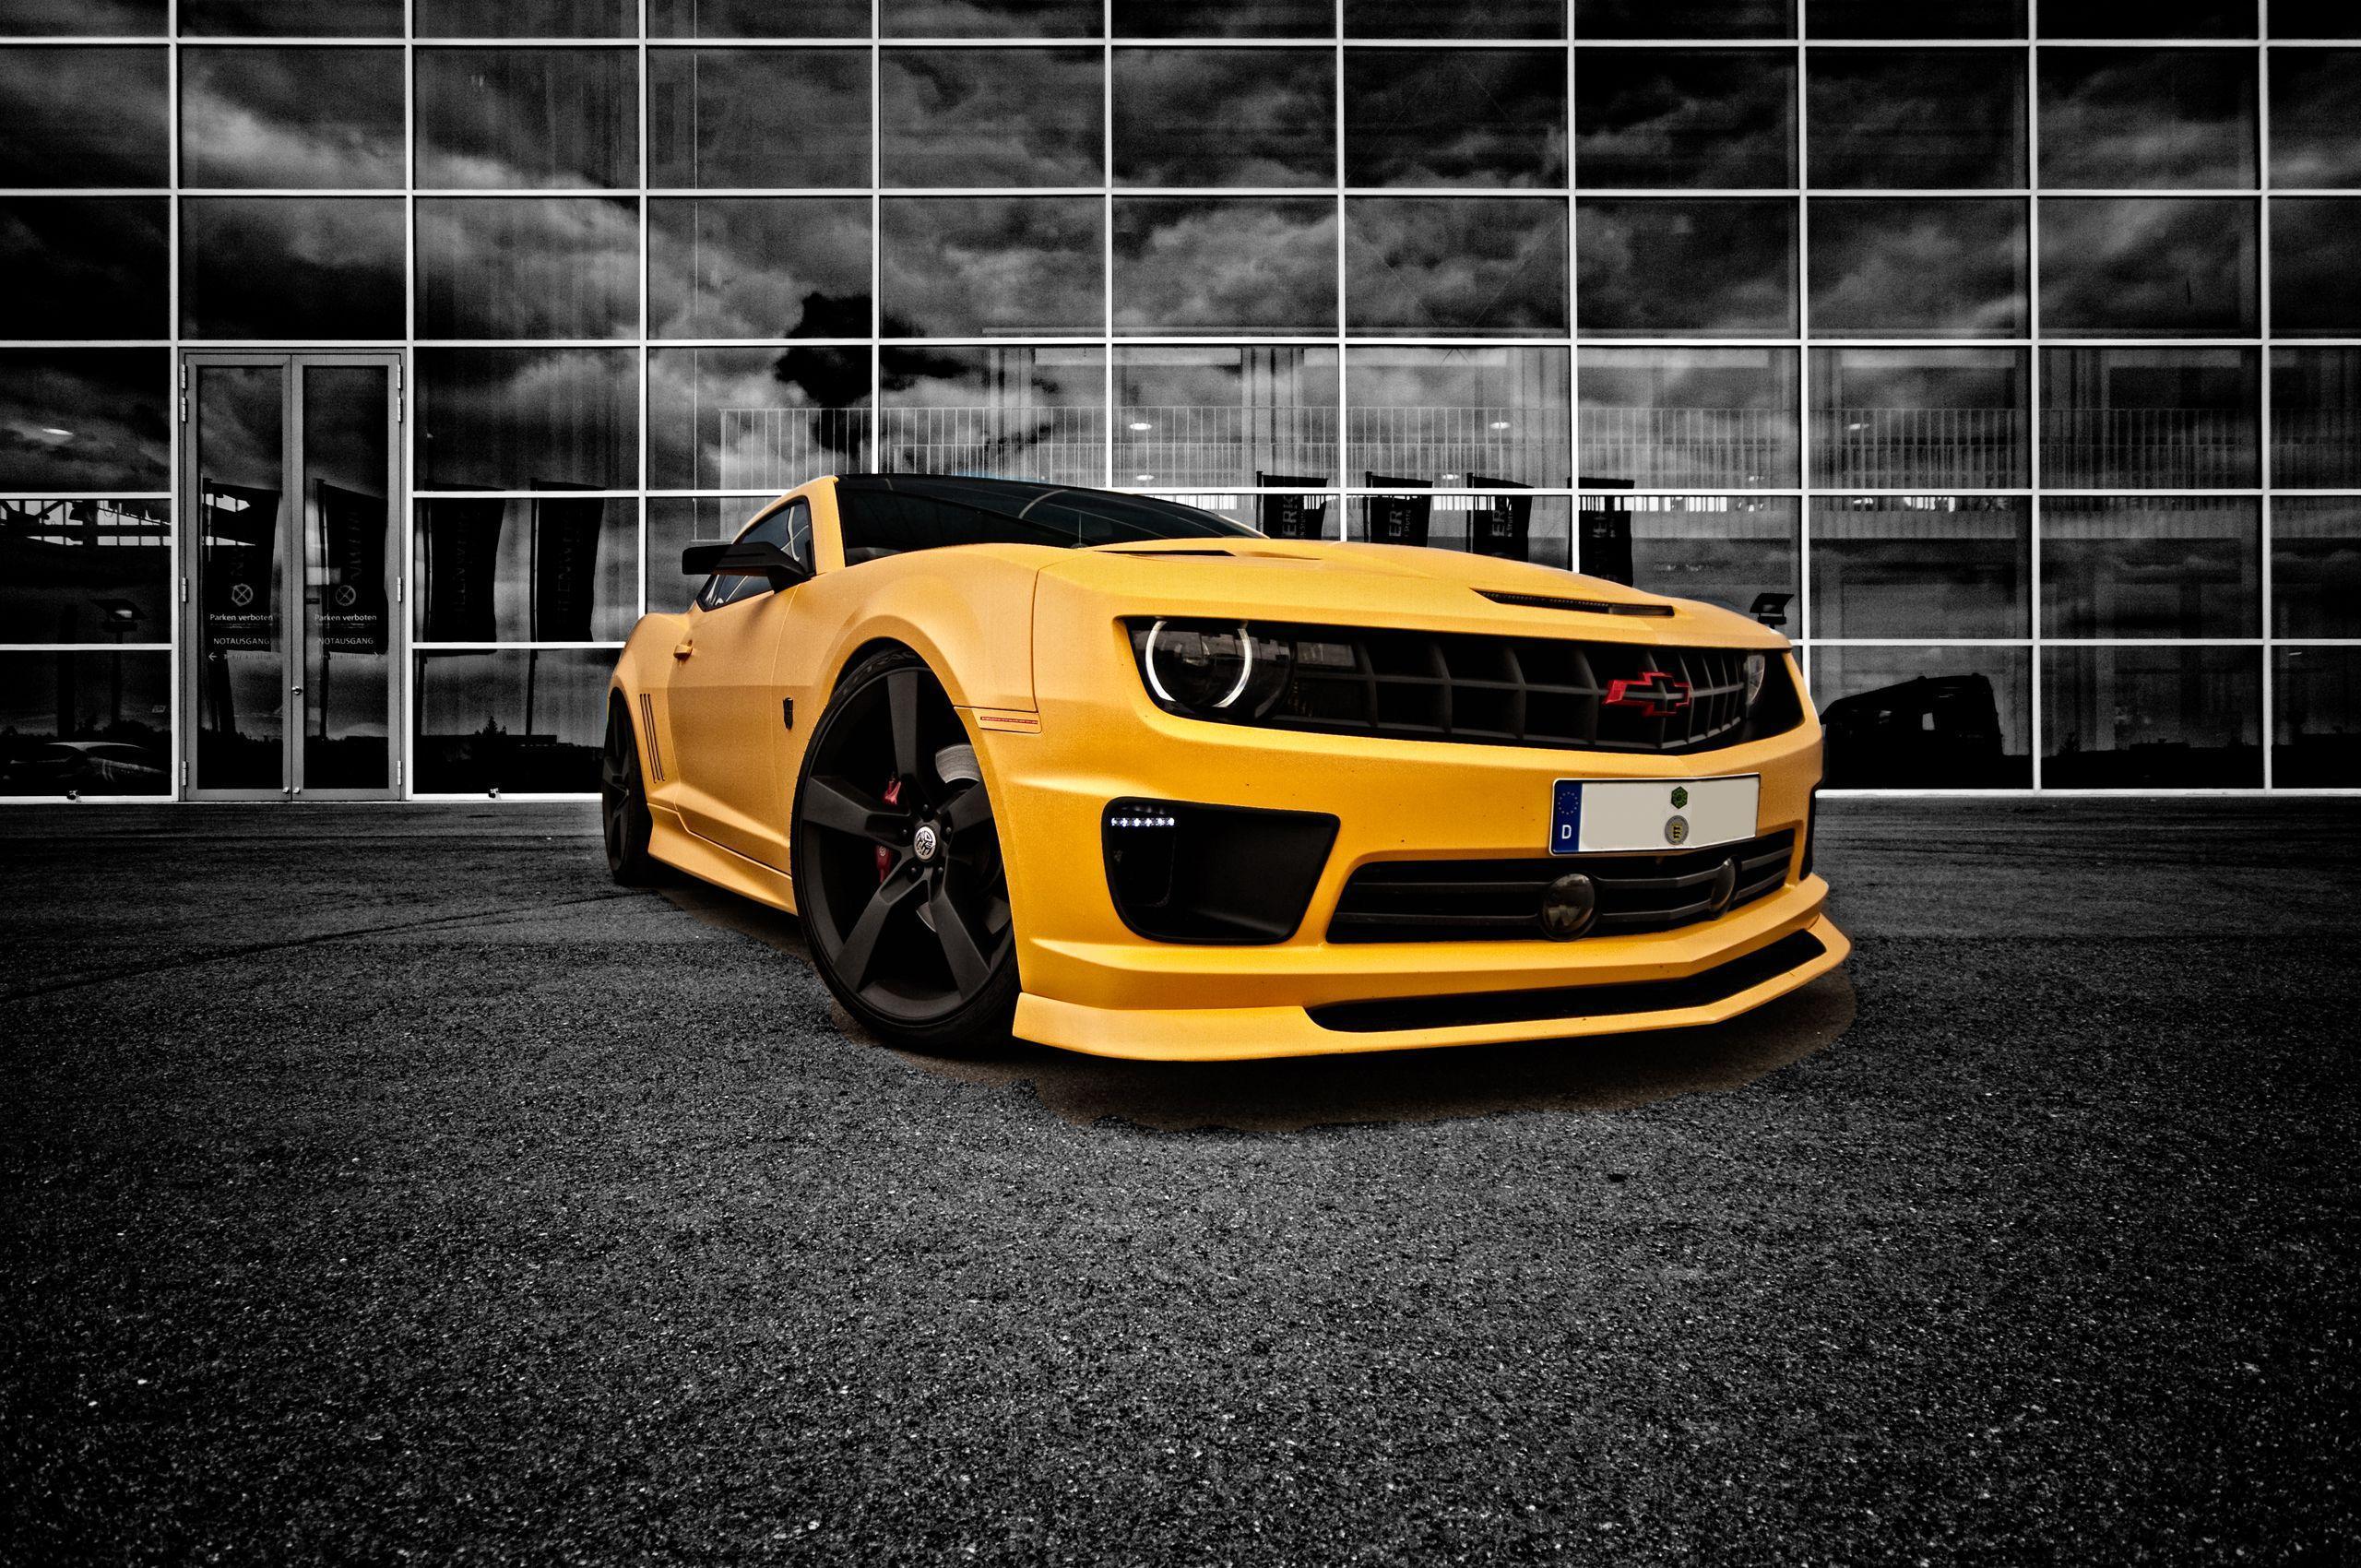 Bumblebee camaro wallpapers top free bumblebee camaro - Transformers bumblebee car wallpaper ...